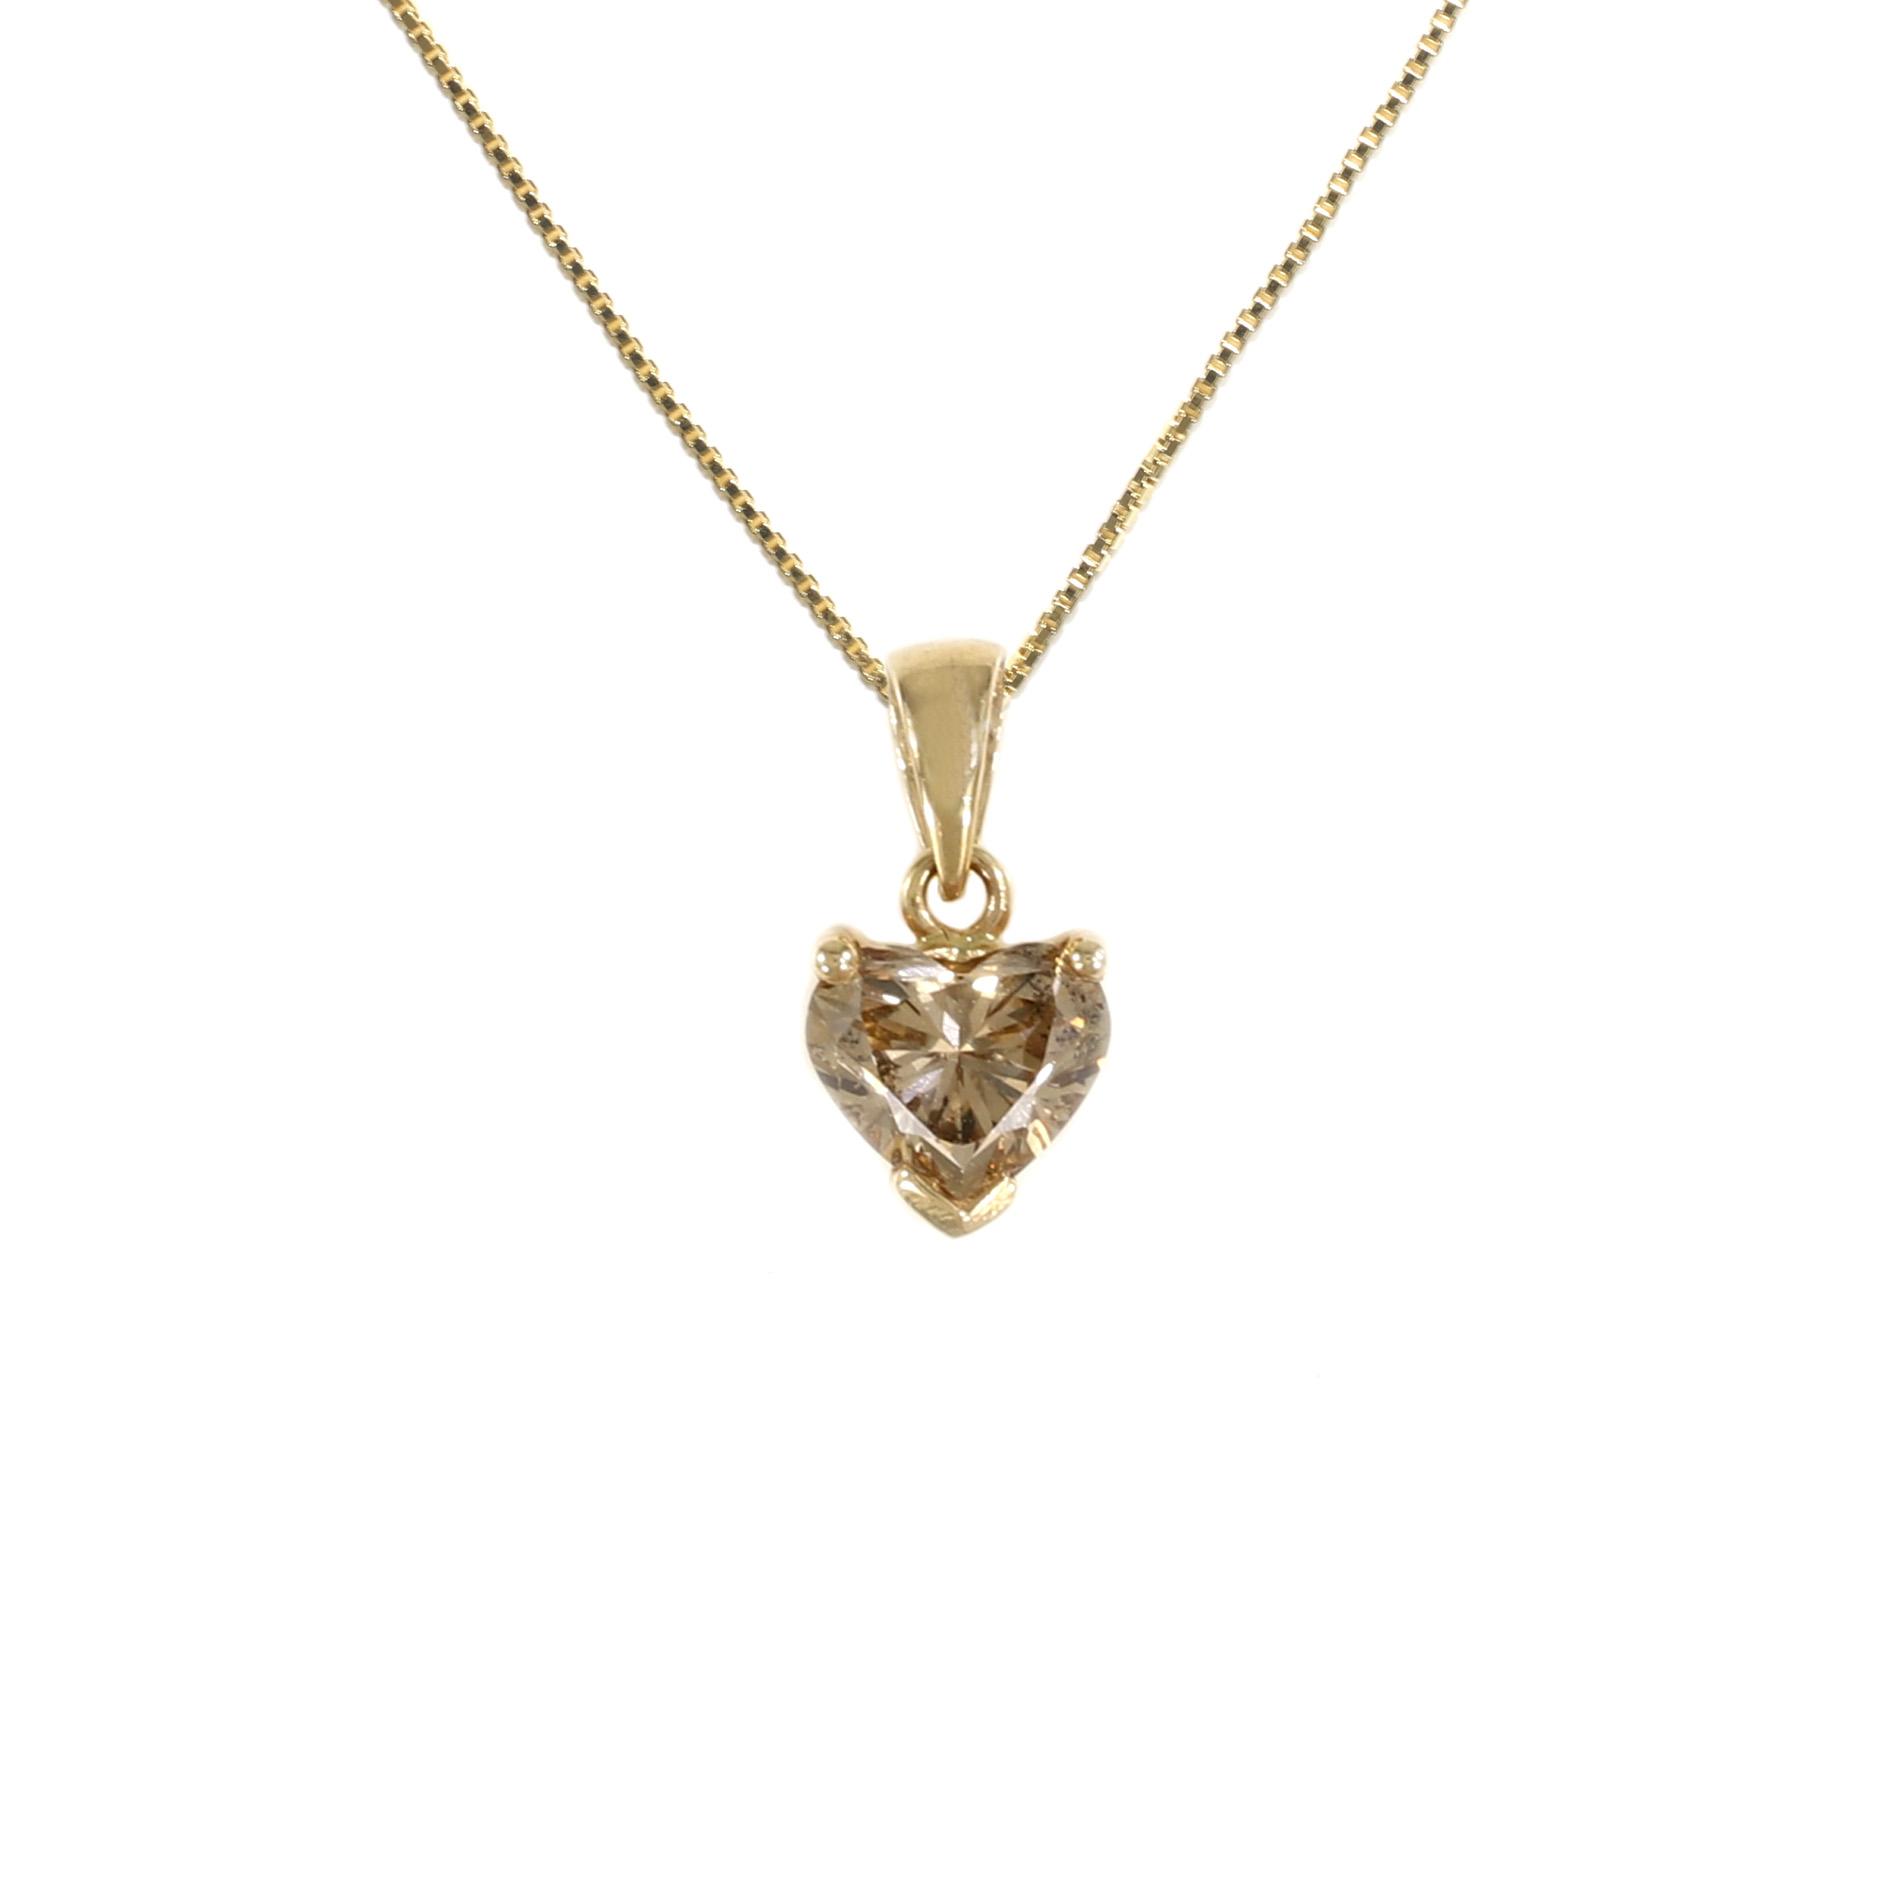 Tamara g designs champagne heart solitaire pendant champagne heart solitaire pendant aloadofball Choice Image